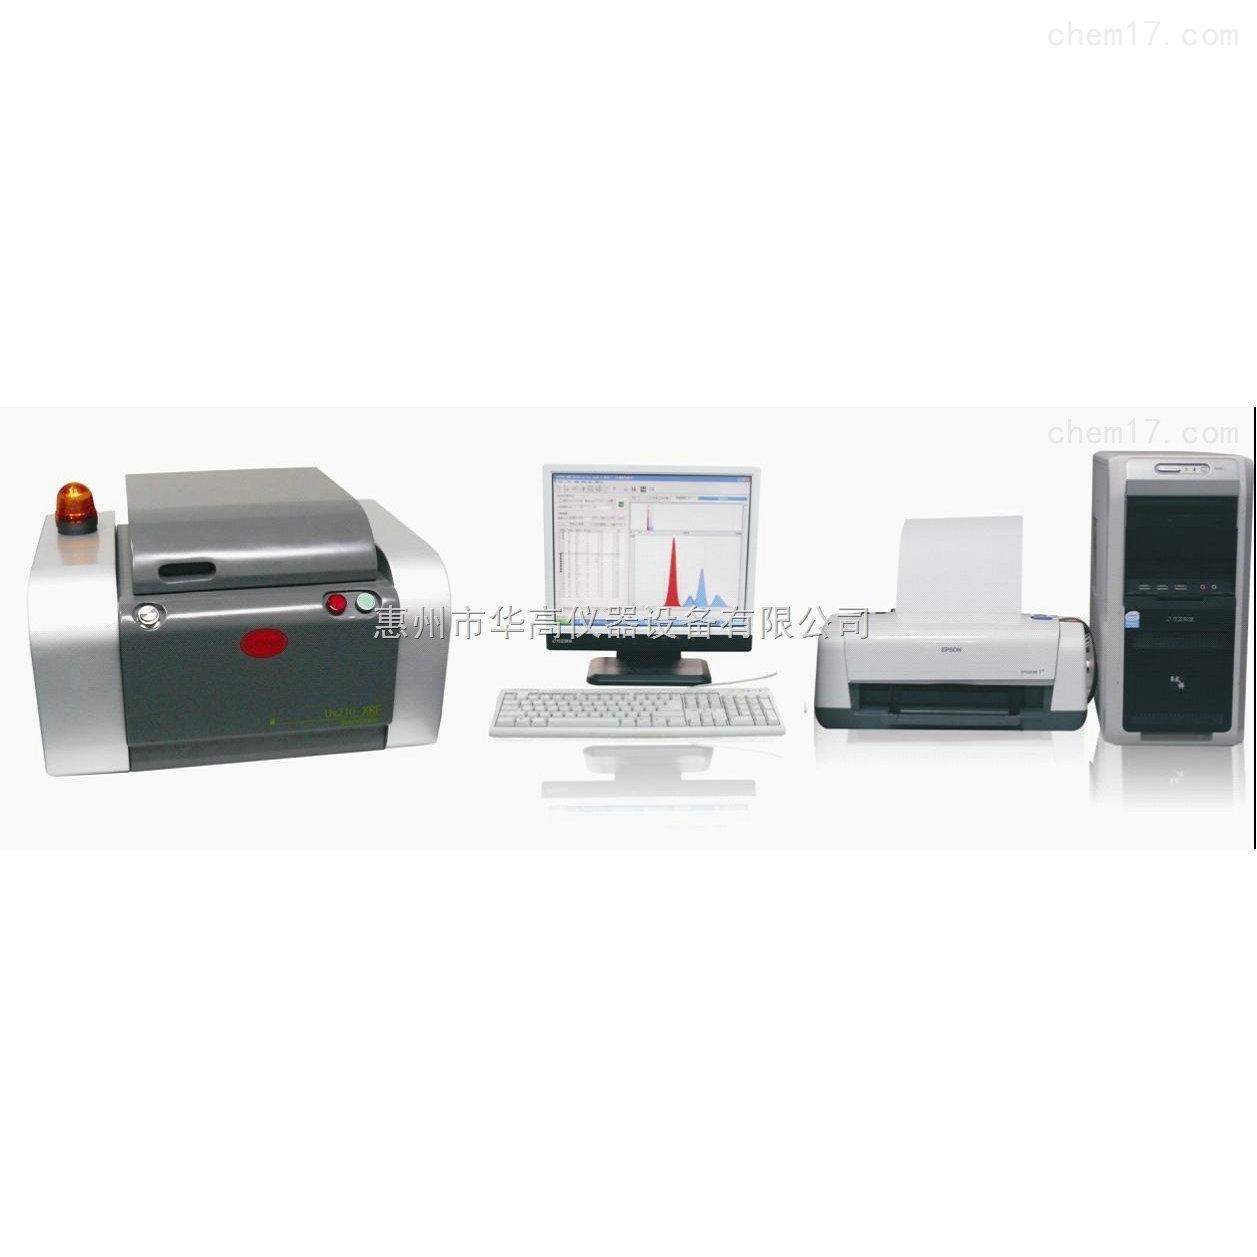 UX-220 RoHS检测仪X射线荧光光谱分析仪